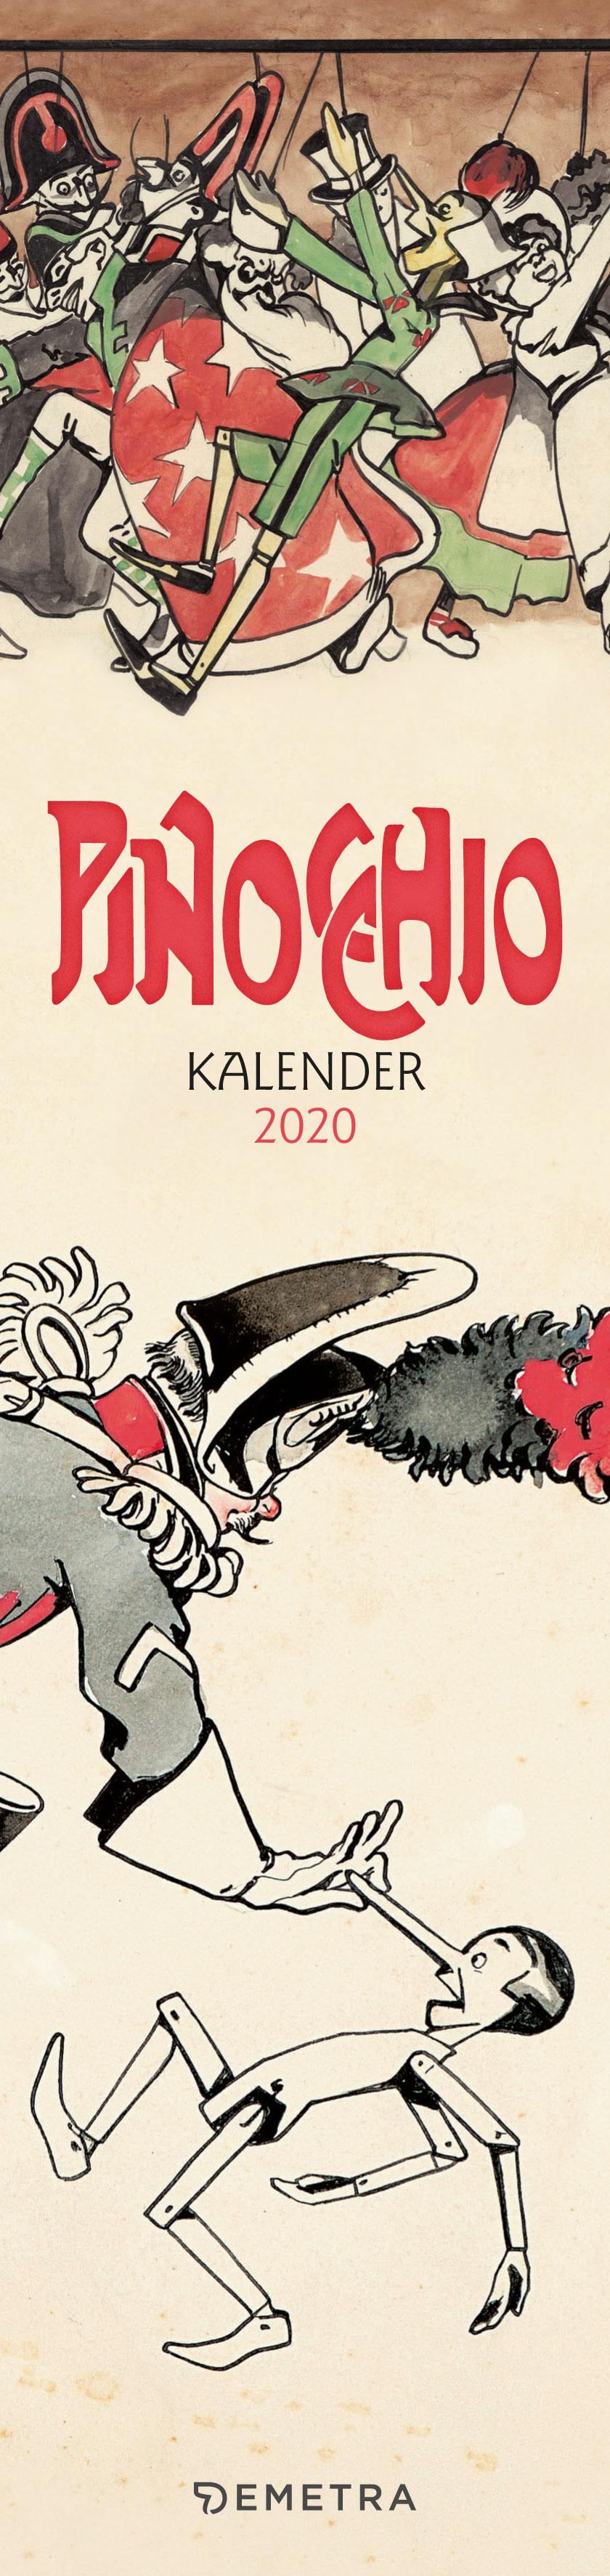 Pinocchio Kalender 2020